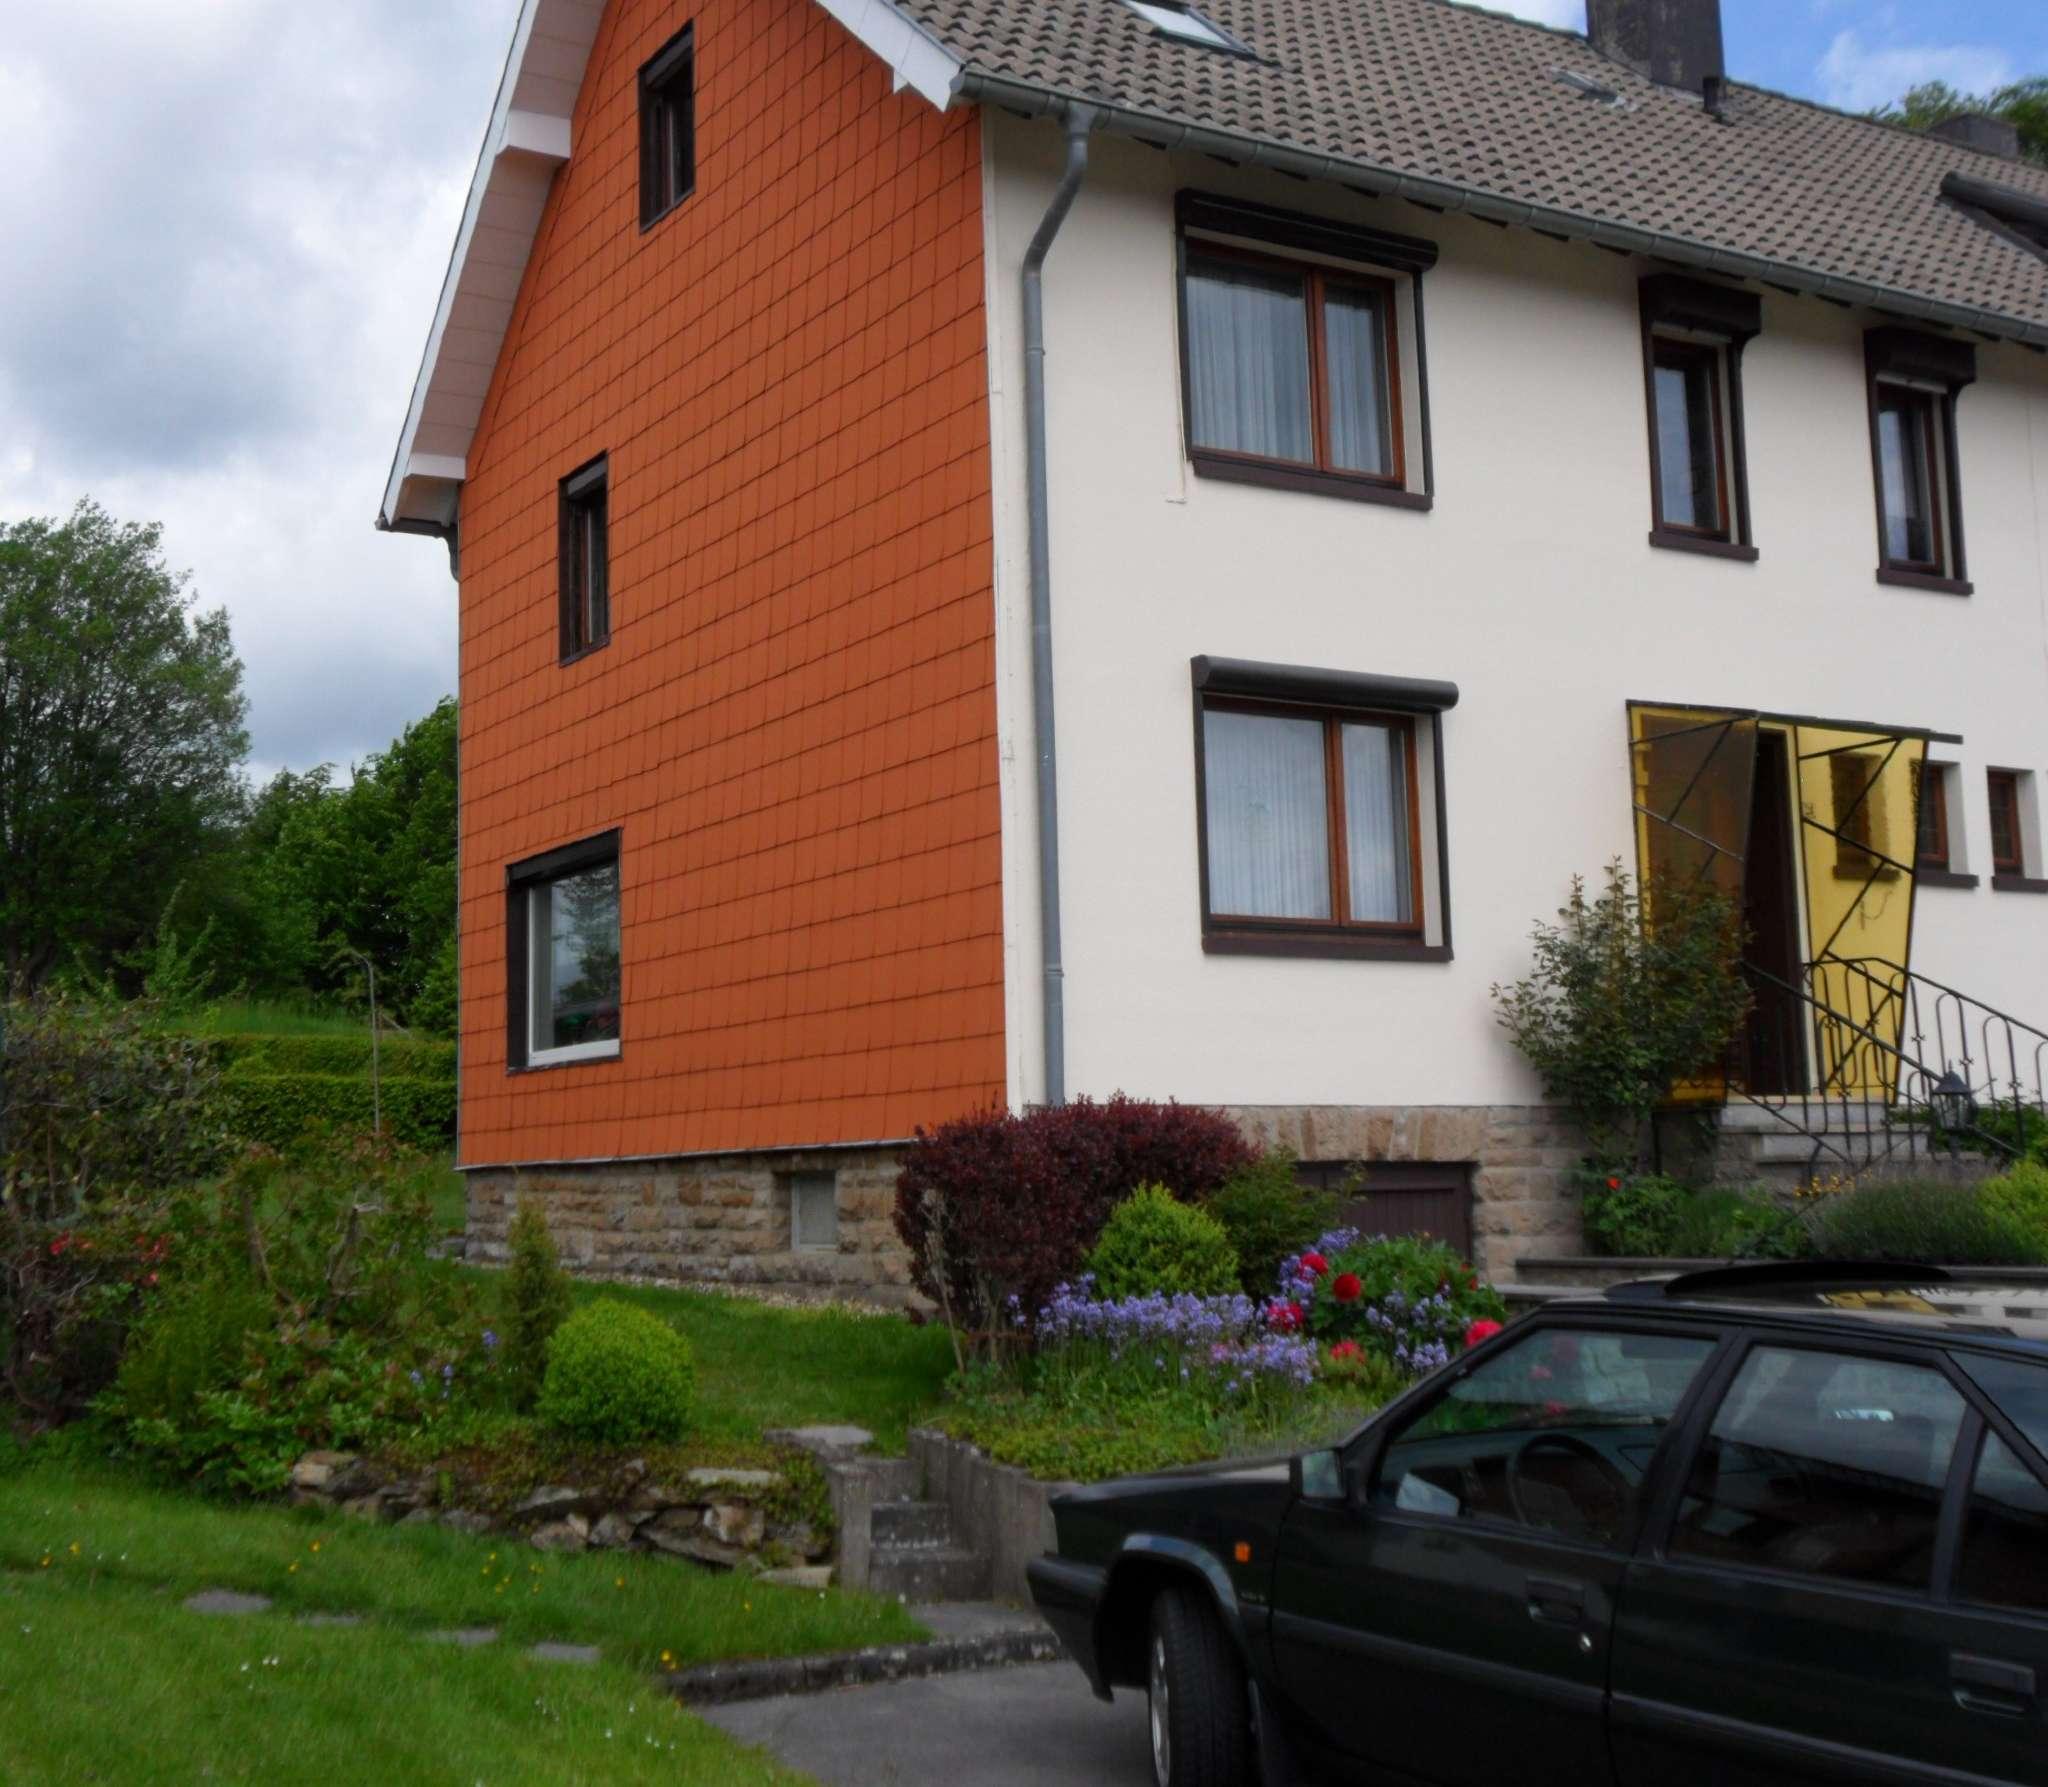 ferienhaus 39 haus am ravelradweg 39 in simmerath lammersdorf nordrhein westfalen alexandra schmidt. Black Bedroom Furniture Sets. Home Design Ideas